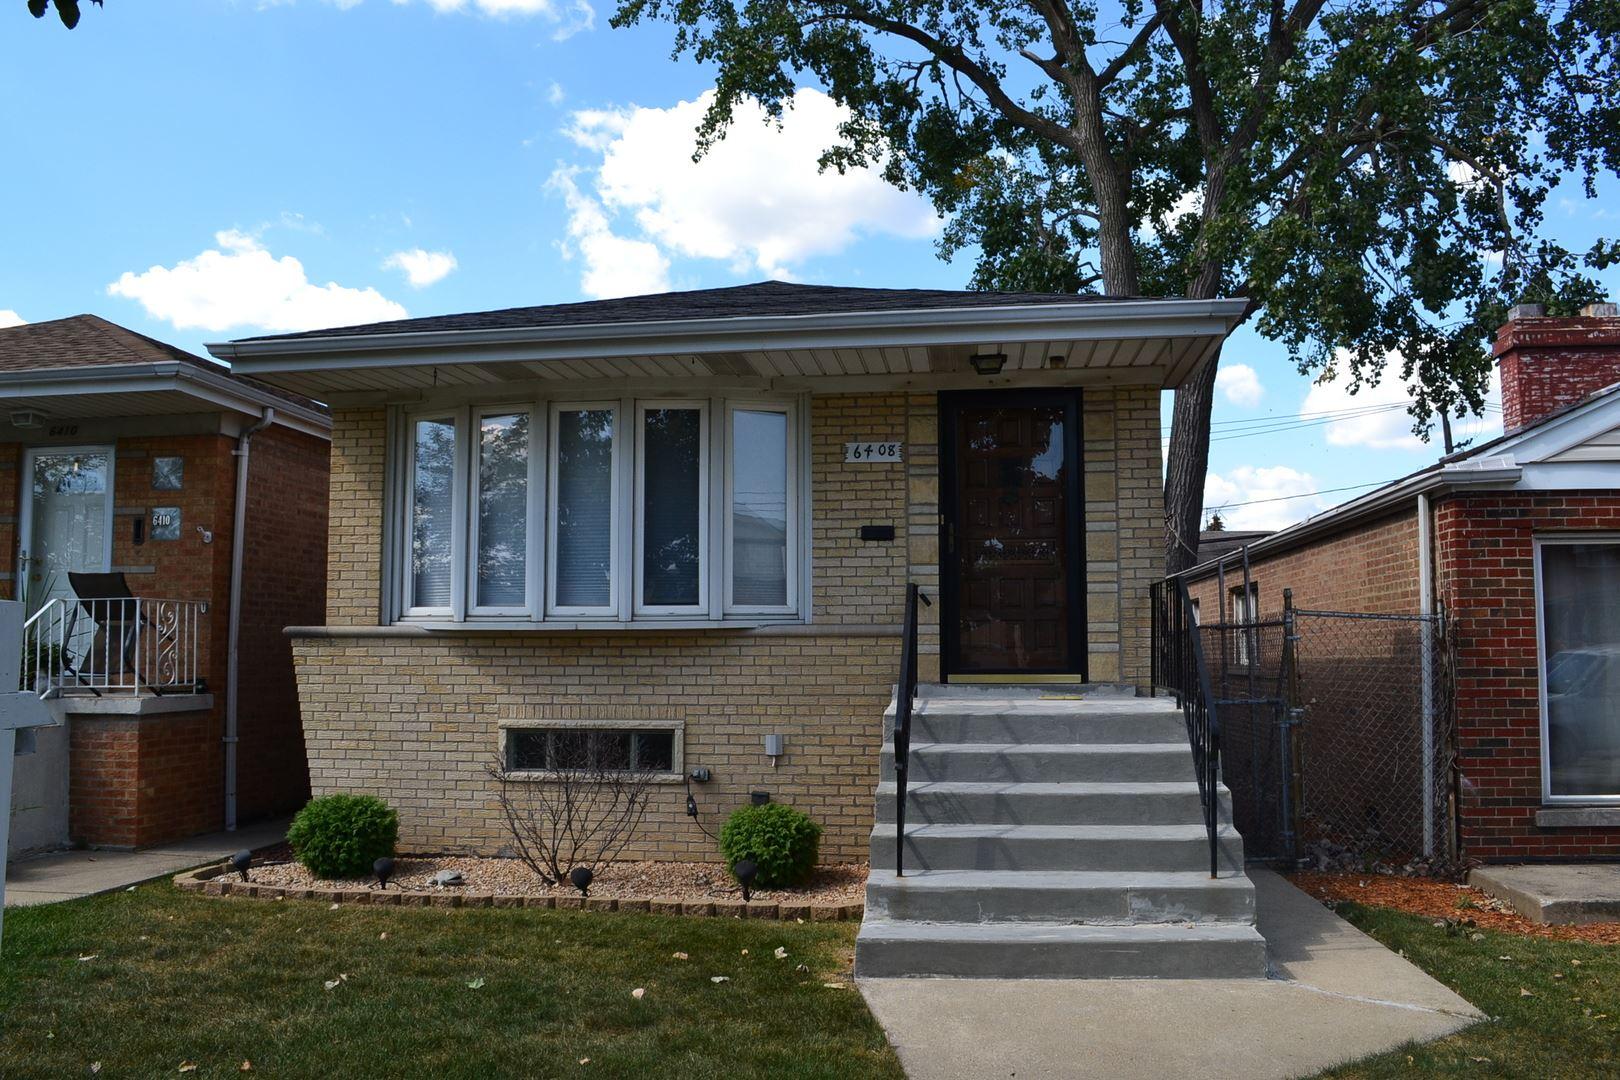 6408 S Narragansett Avenue, Chicago, IL 60638 - #: 11155806